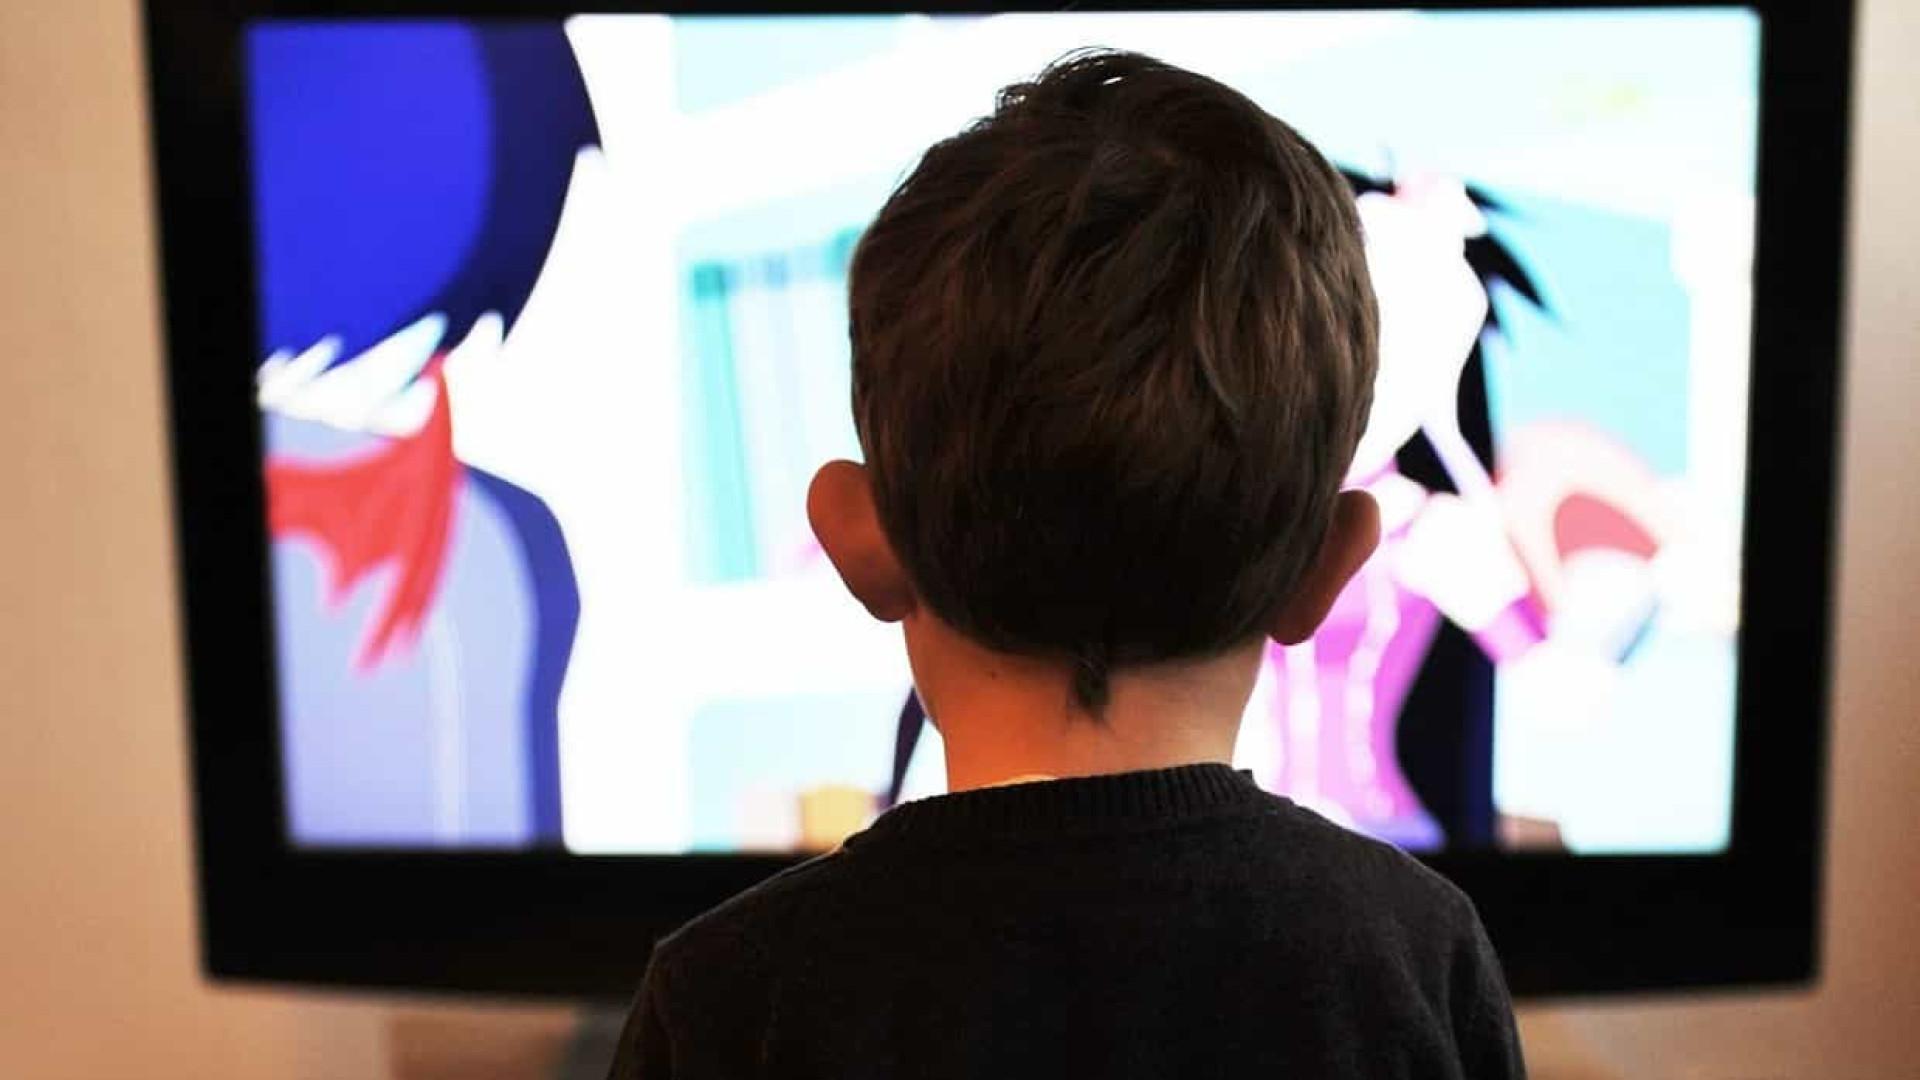 Amazon libera acesso a filmes e séries infantis durante pandemia